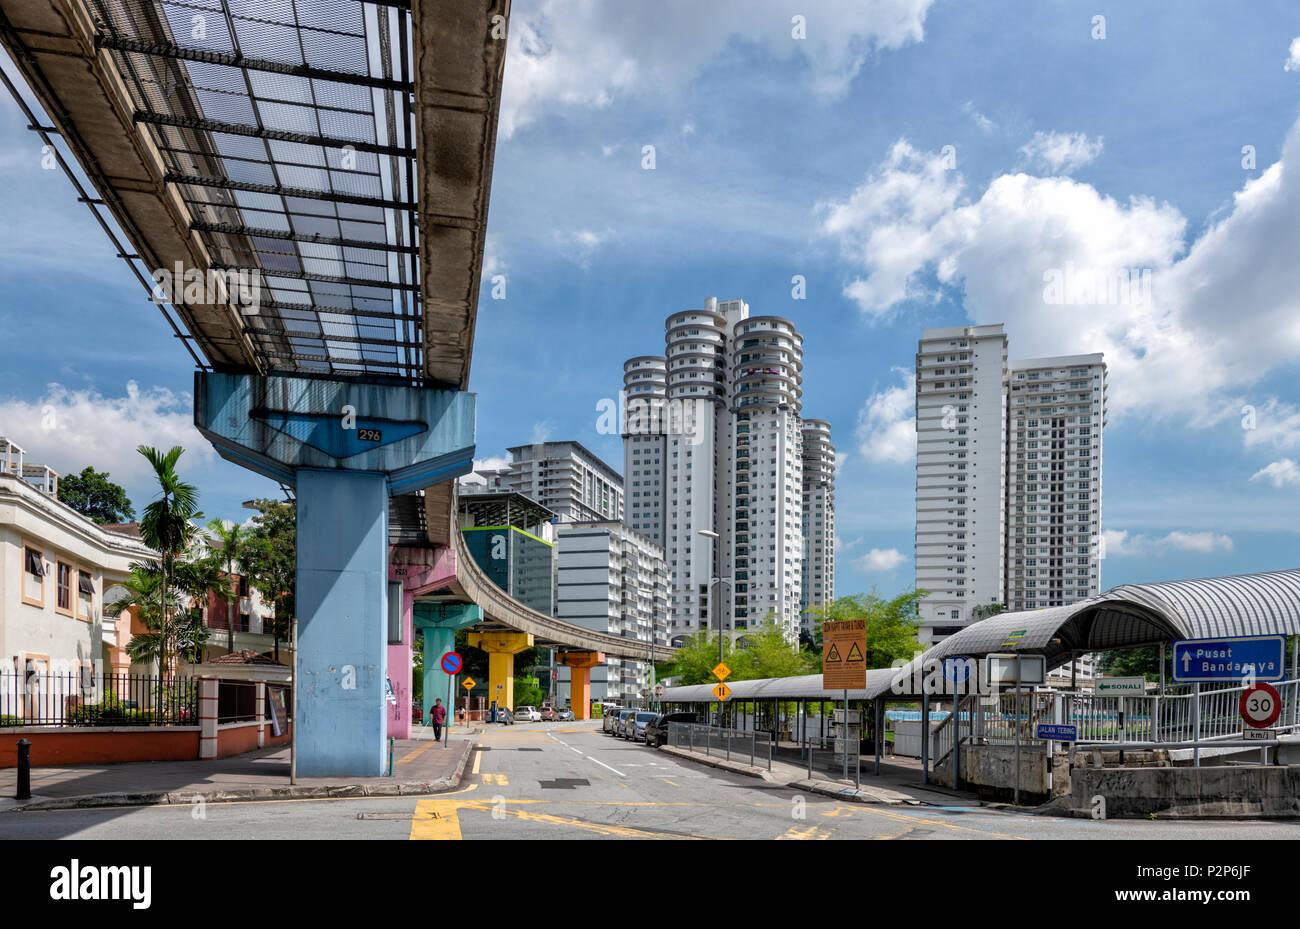 Eine Einschienenbahn verbindet den Flughafen in Kuala Lumpur City Centre. Kuala Lumpur, Malaysia Stockbild